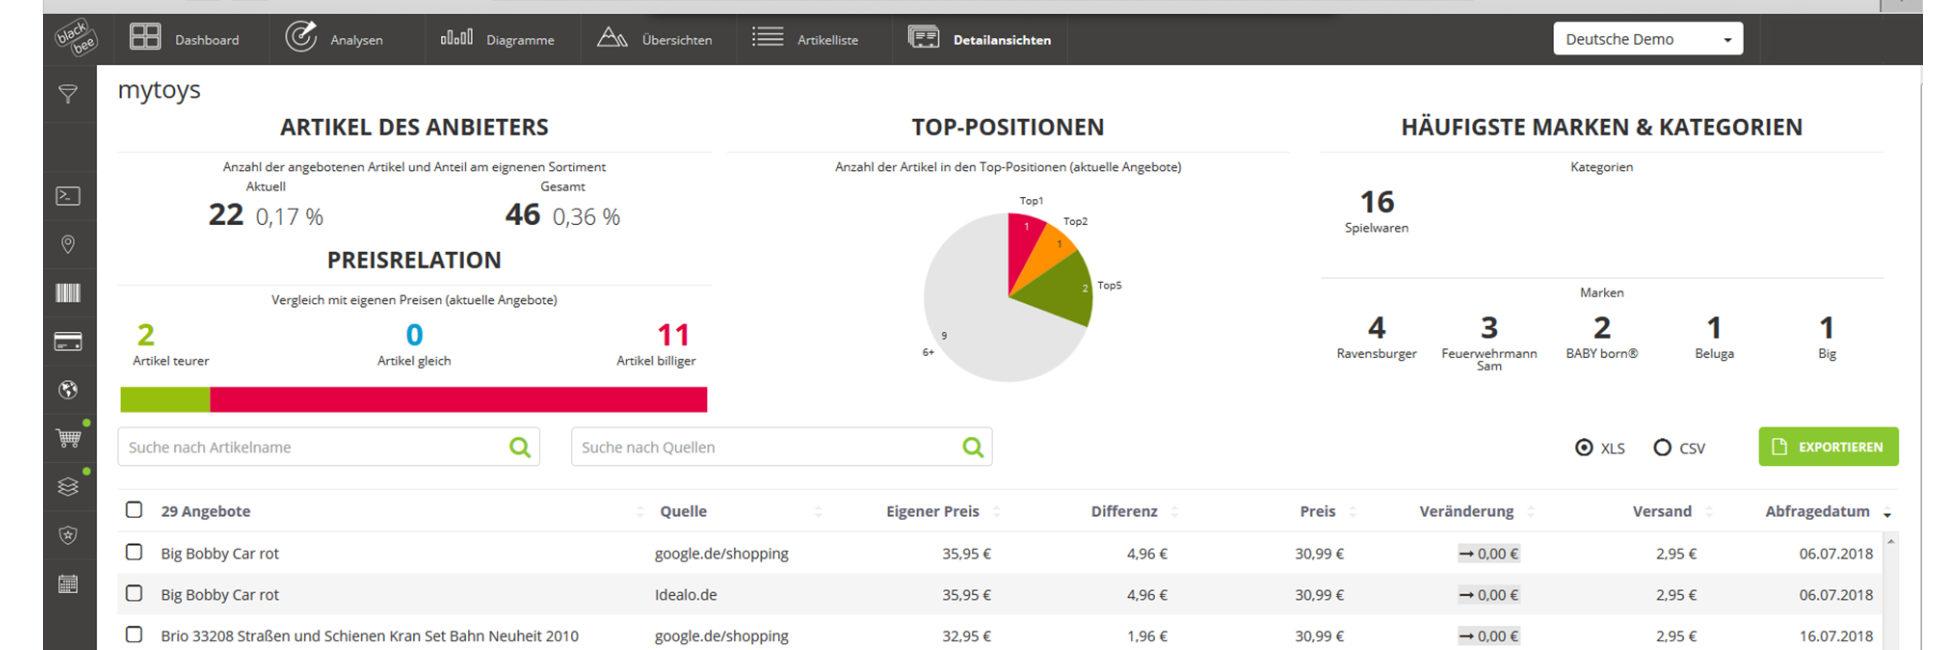 Webdata Solutions GmbH